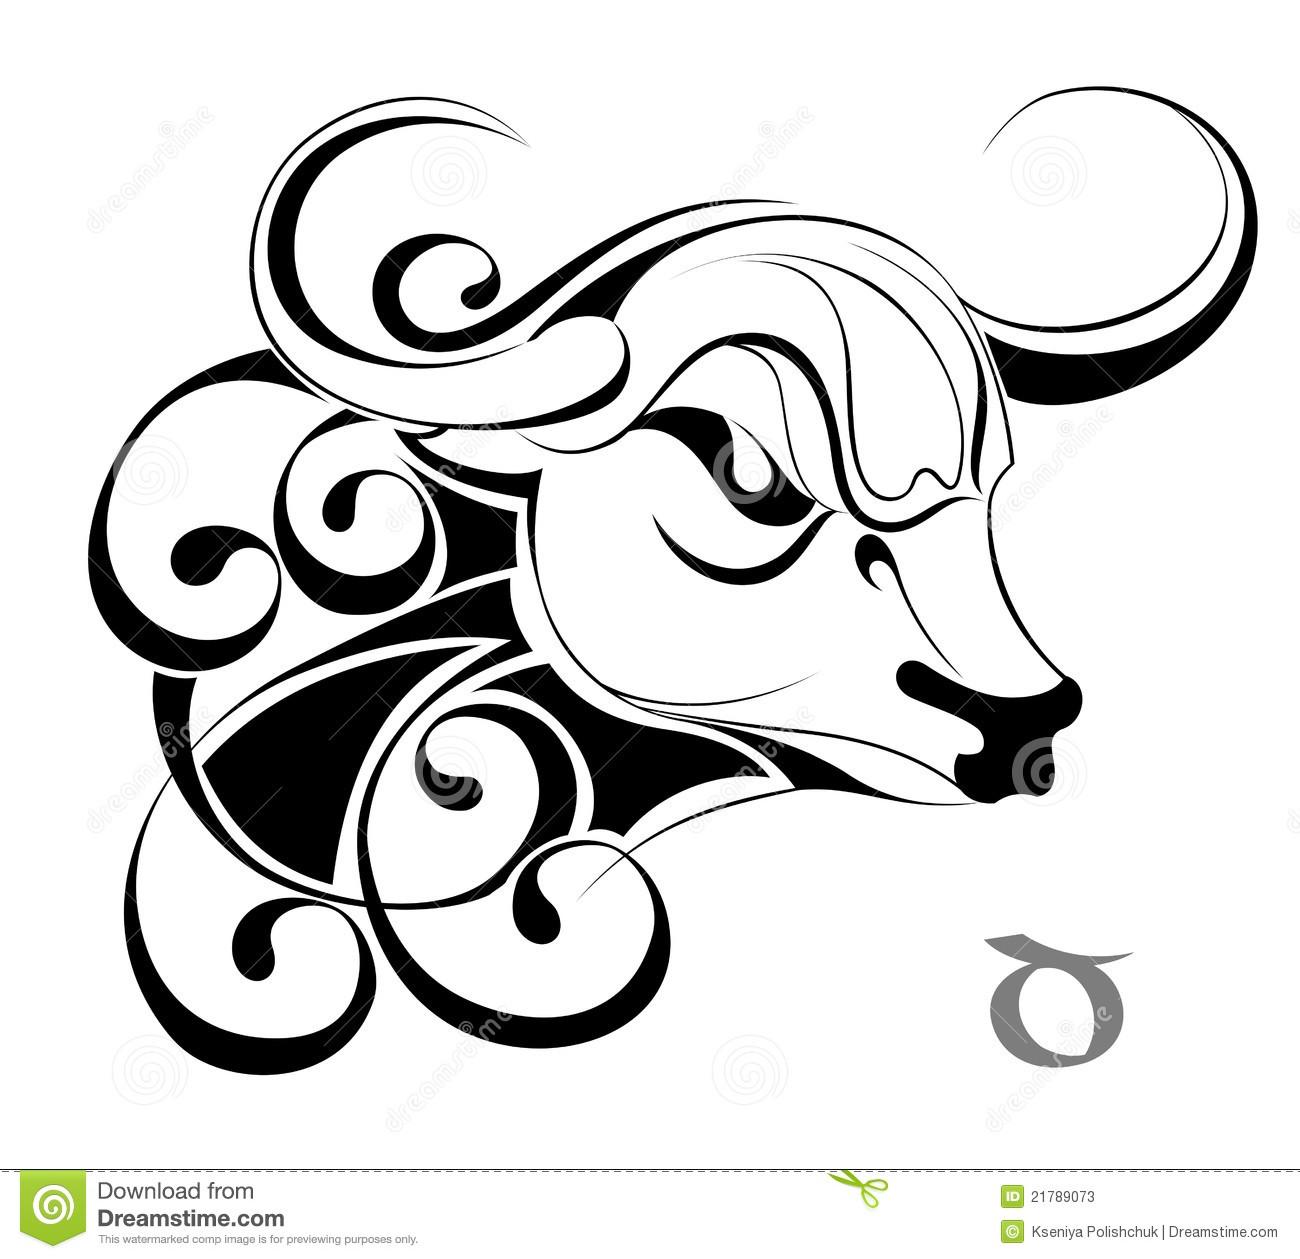 50 zodiac sign tattoos designs. Black Bedroom Furniture Sets. Home Design Ideas